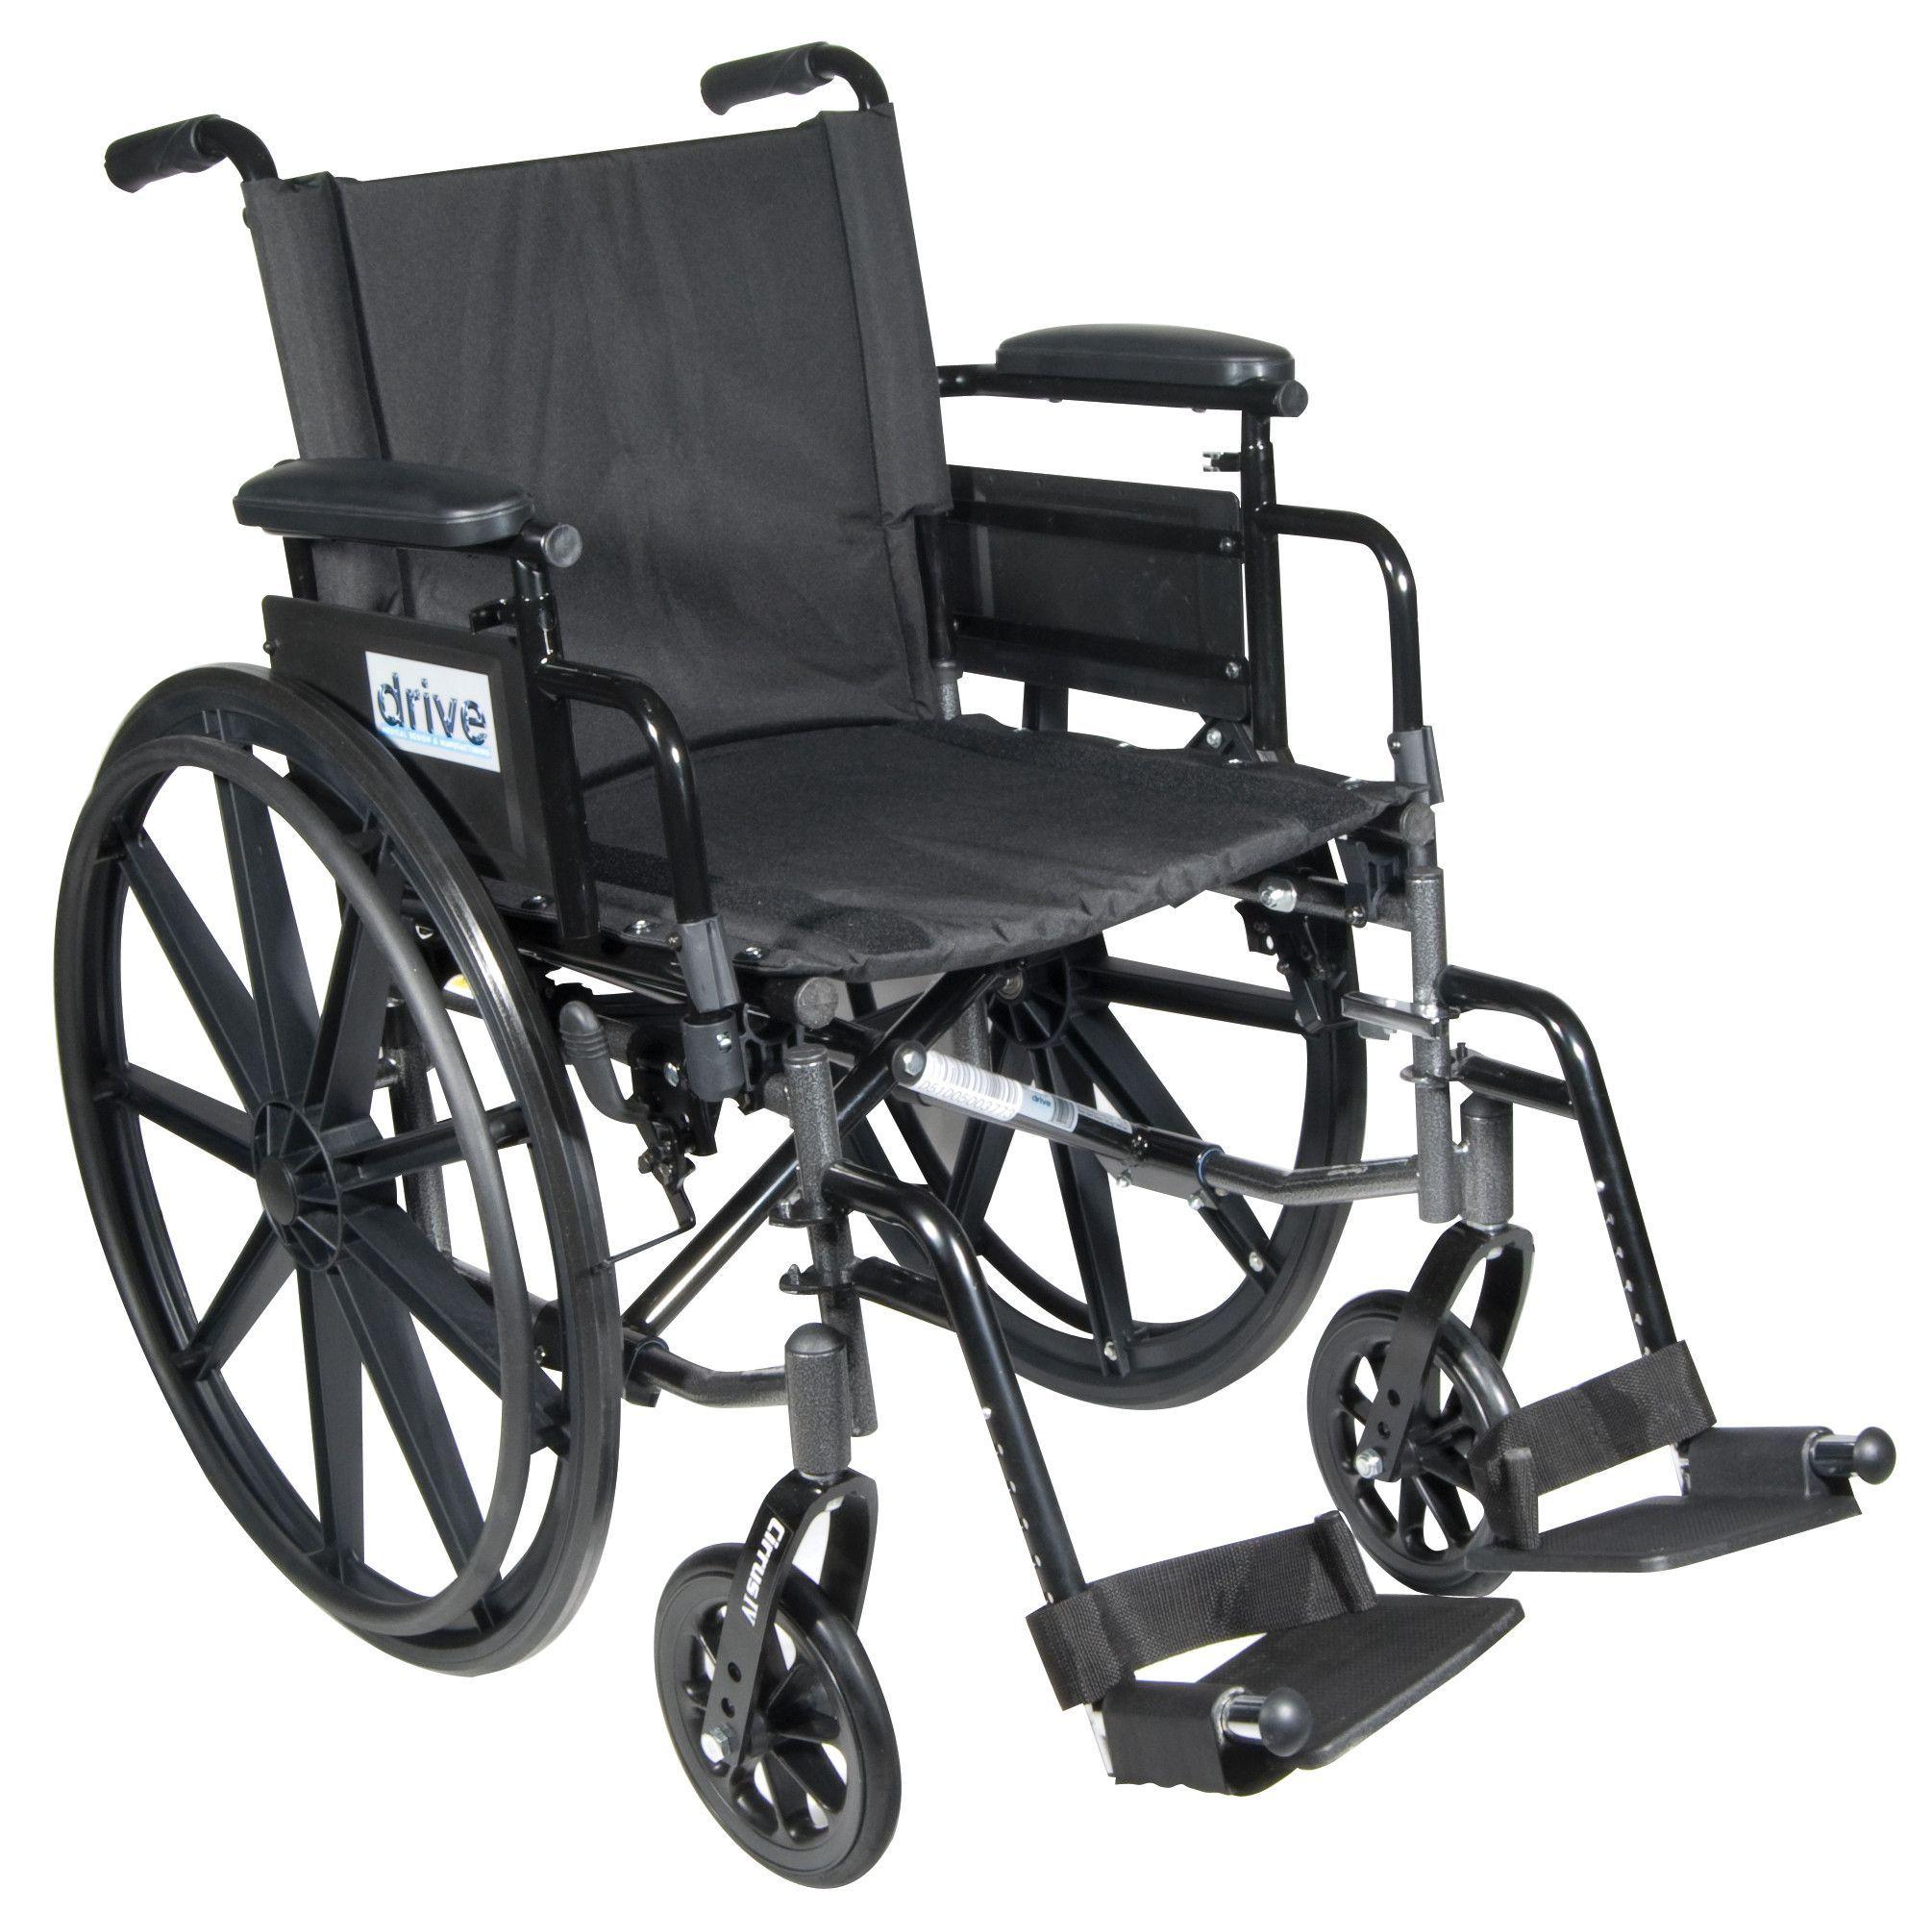 Magnificent Cirrus Iv Lightweight Dual Axle Wheelchair With Adjustable Machost Co Dining Chair Design Ideas Machostcouk